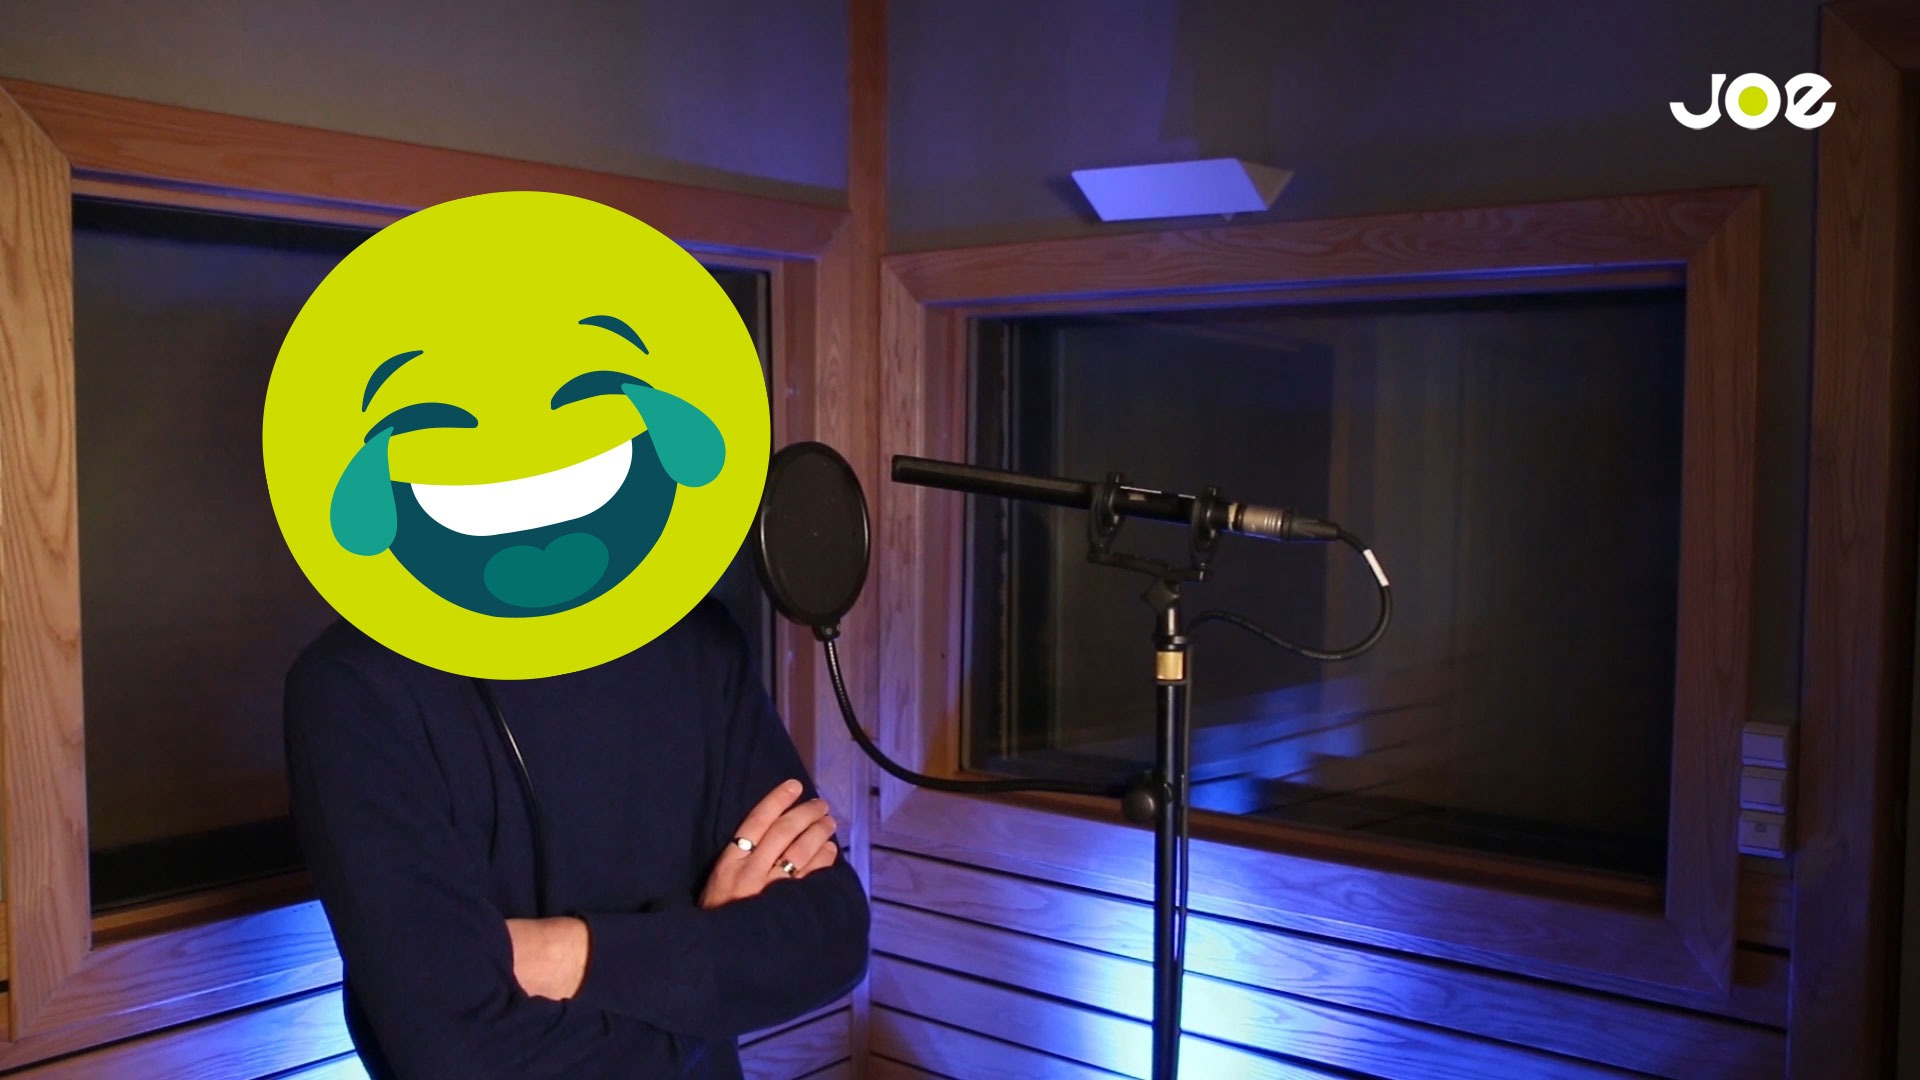 Joe sam smiley